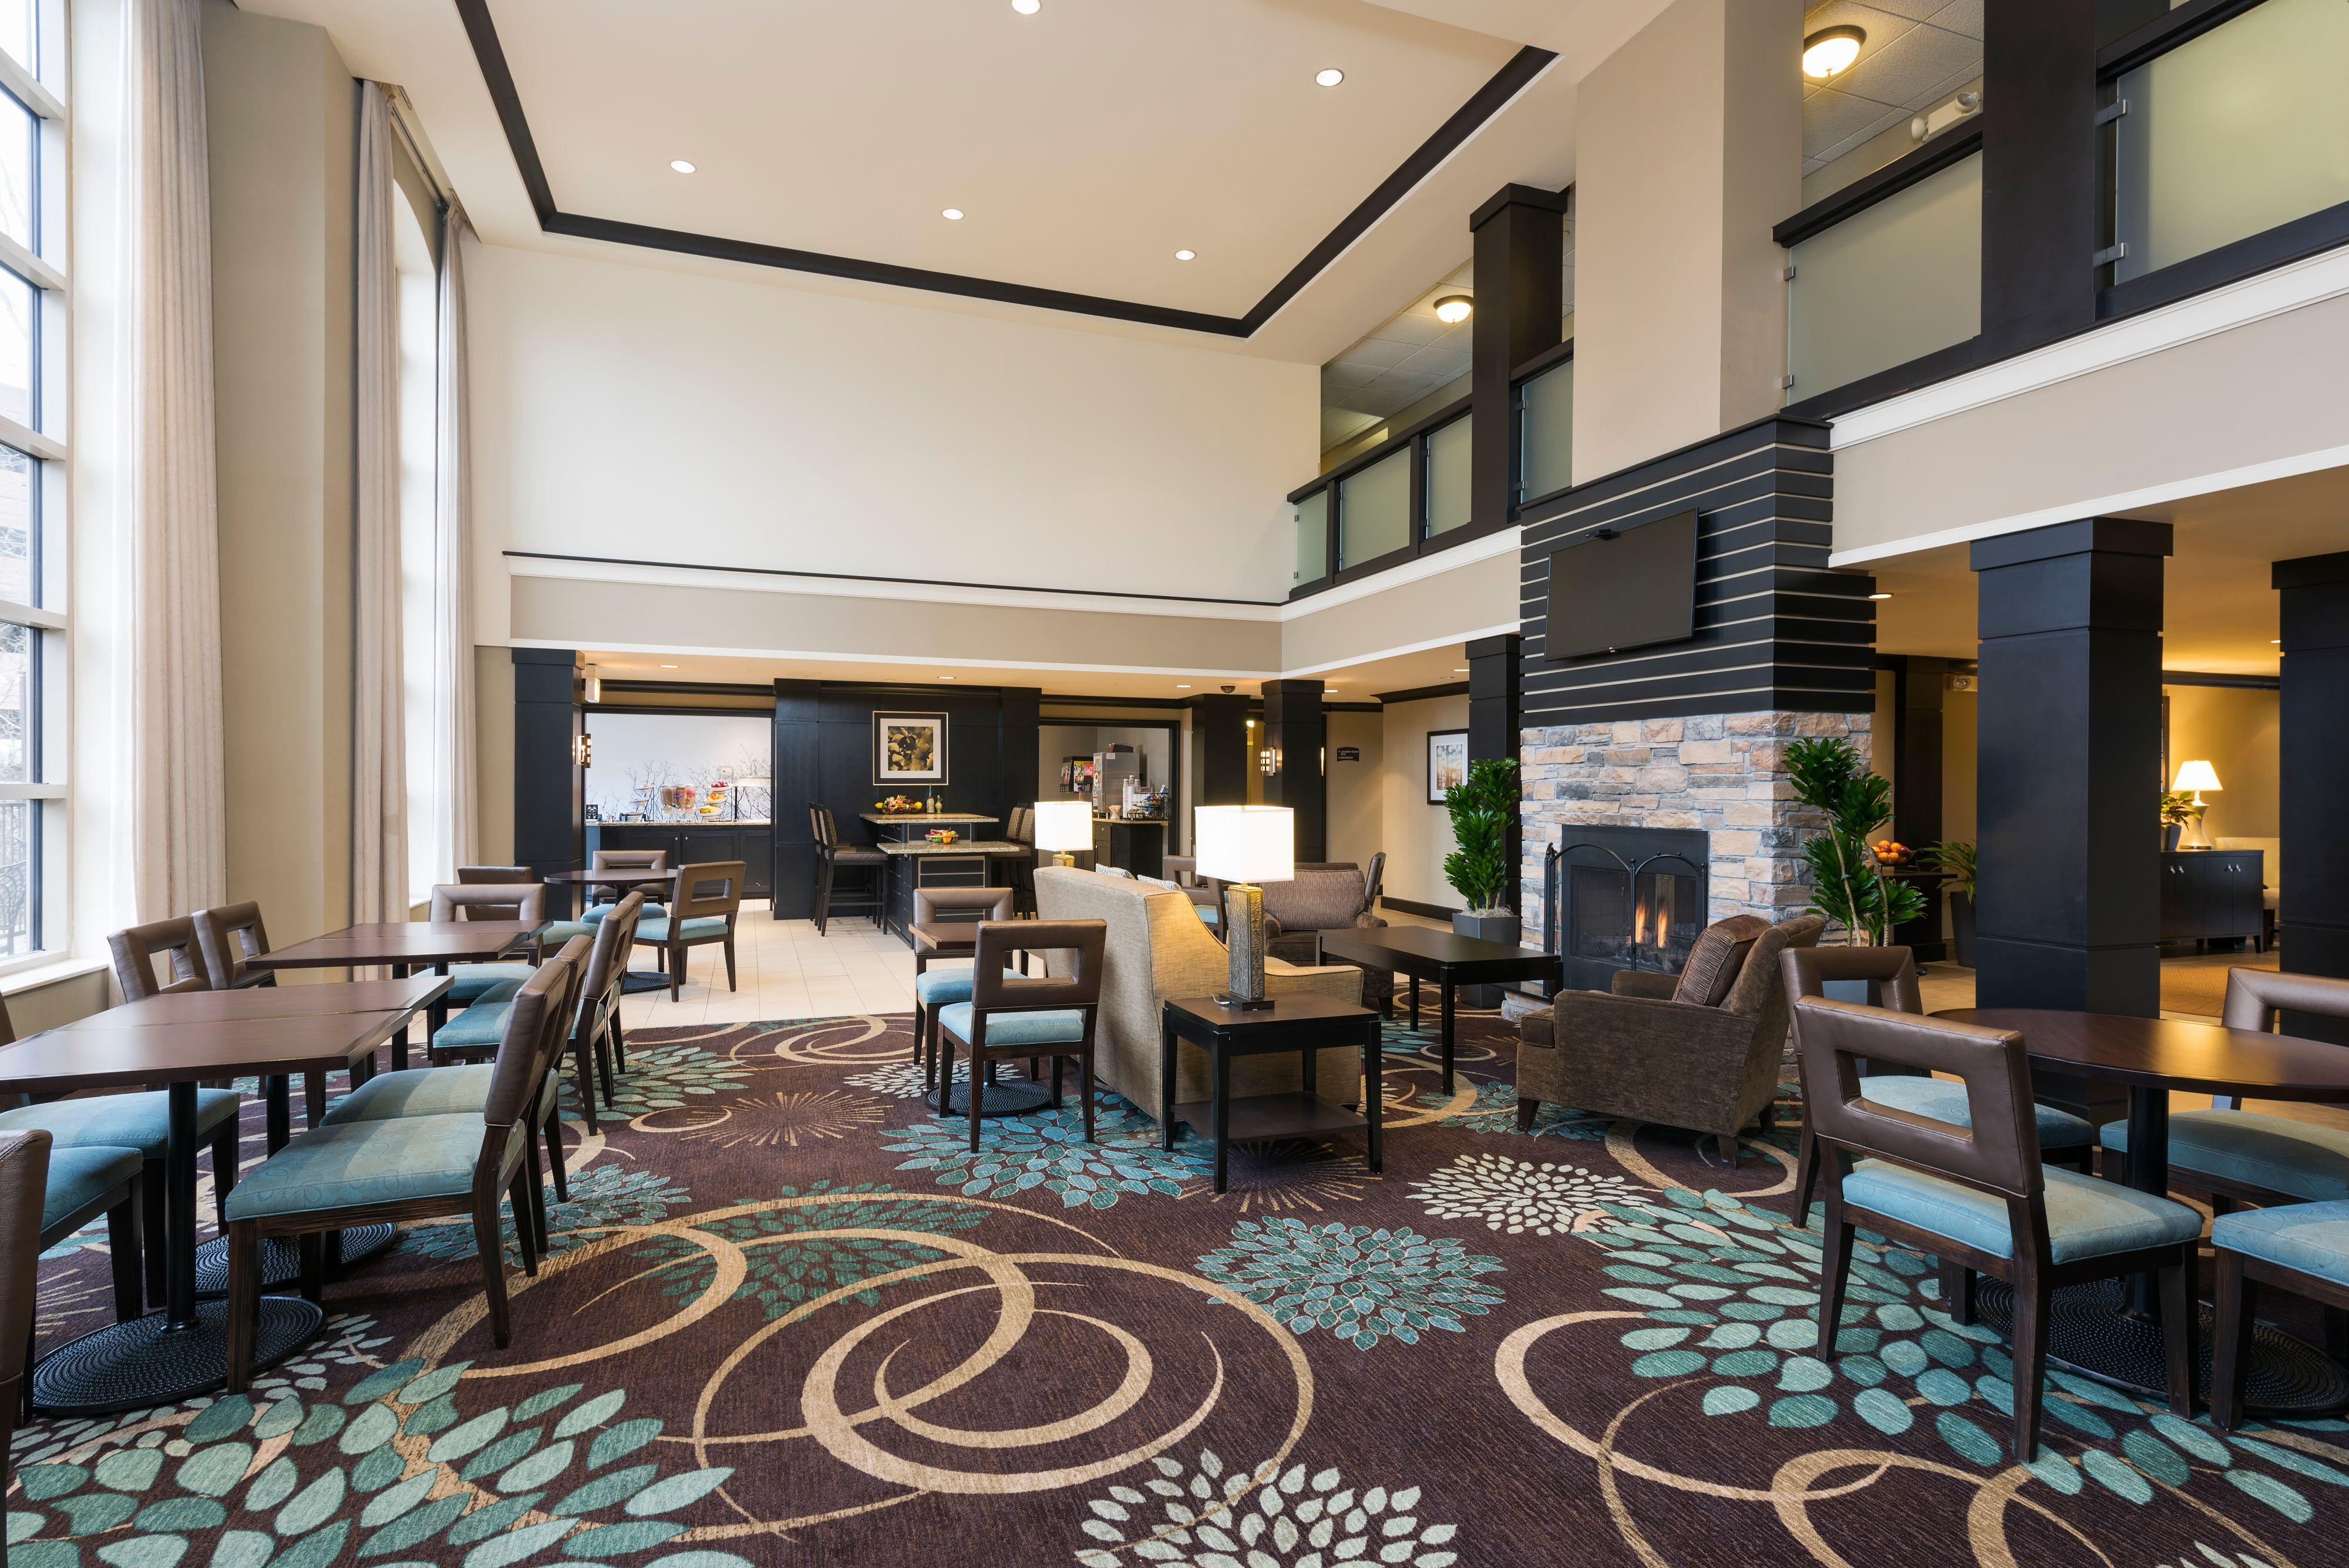 staybridge-suites-oakbrook-terrace-4960036905-original.jpg